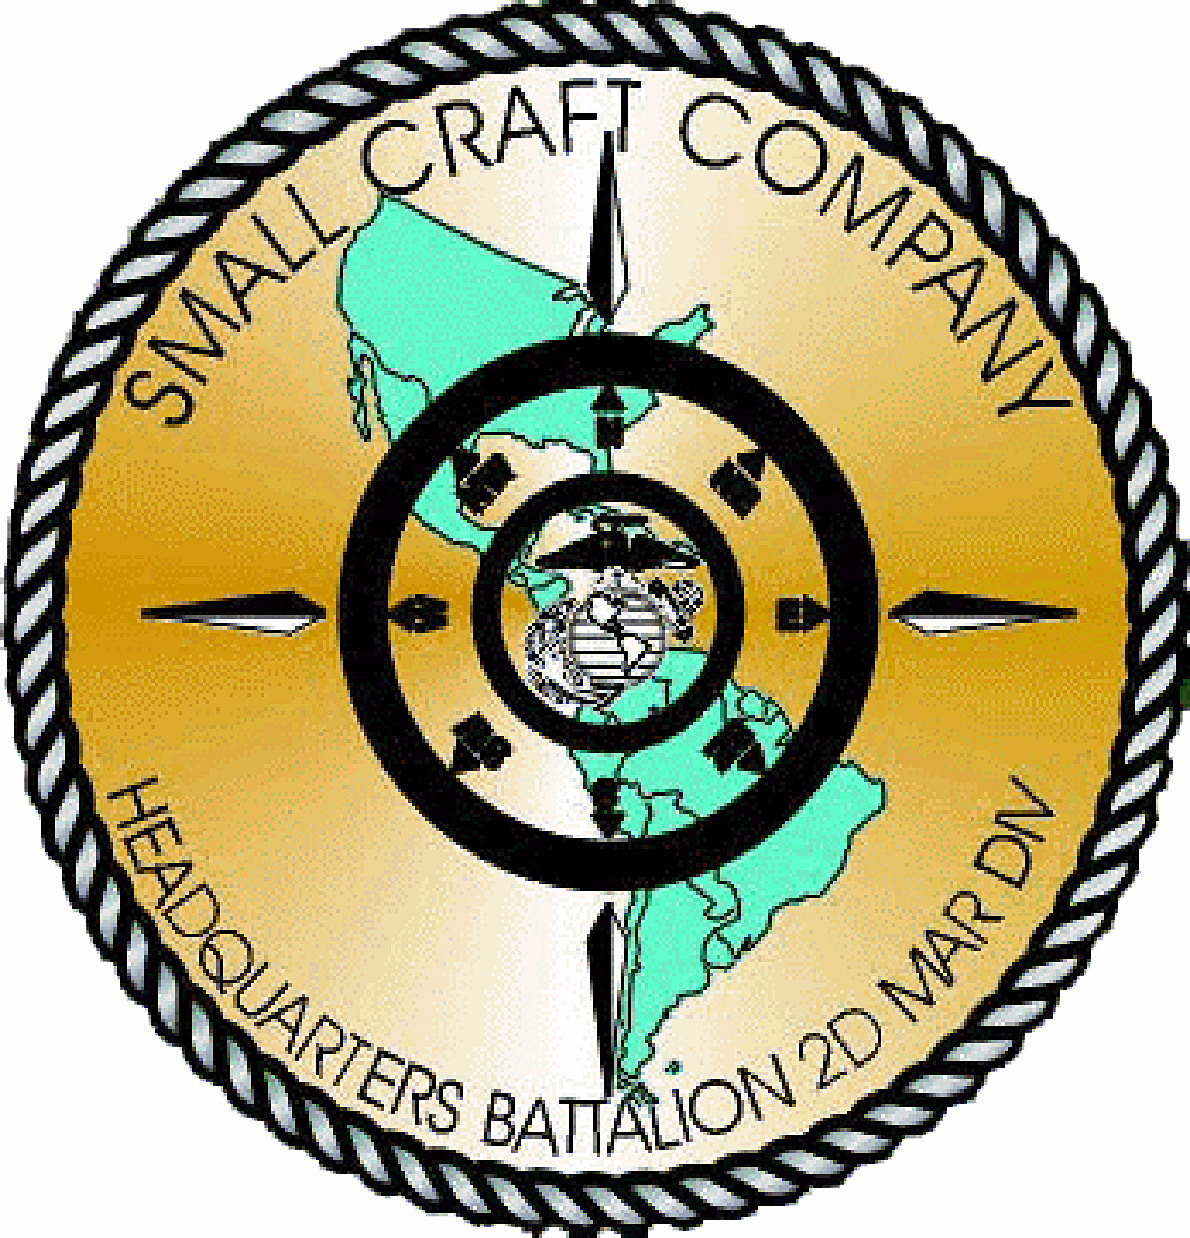 File:Small Craft Company, Headquarters Battalion, 2nd ...